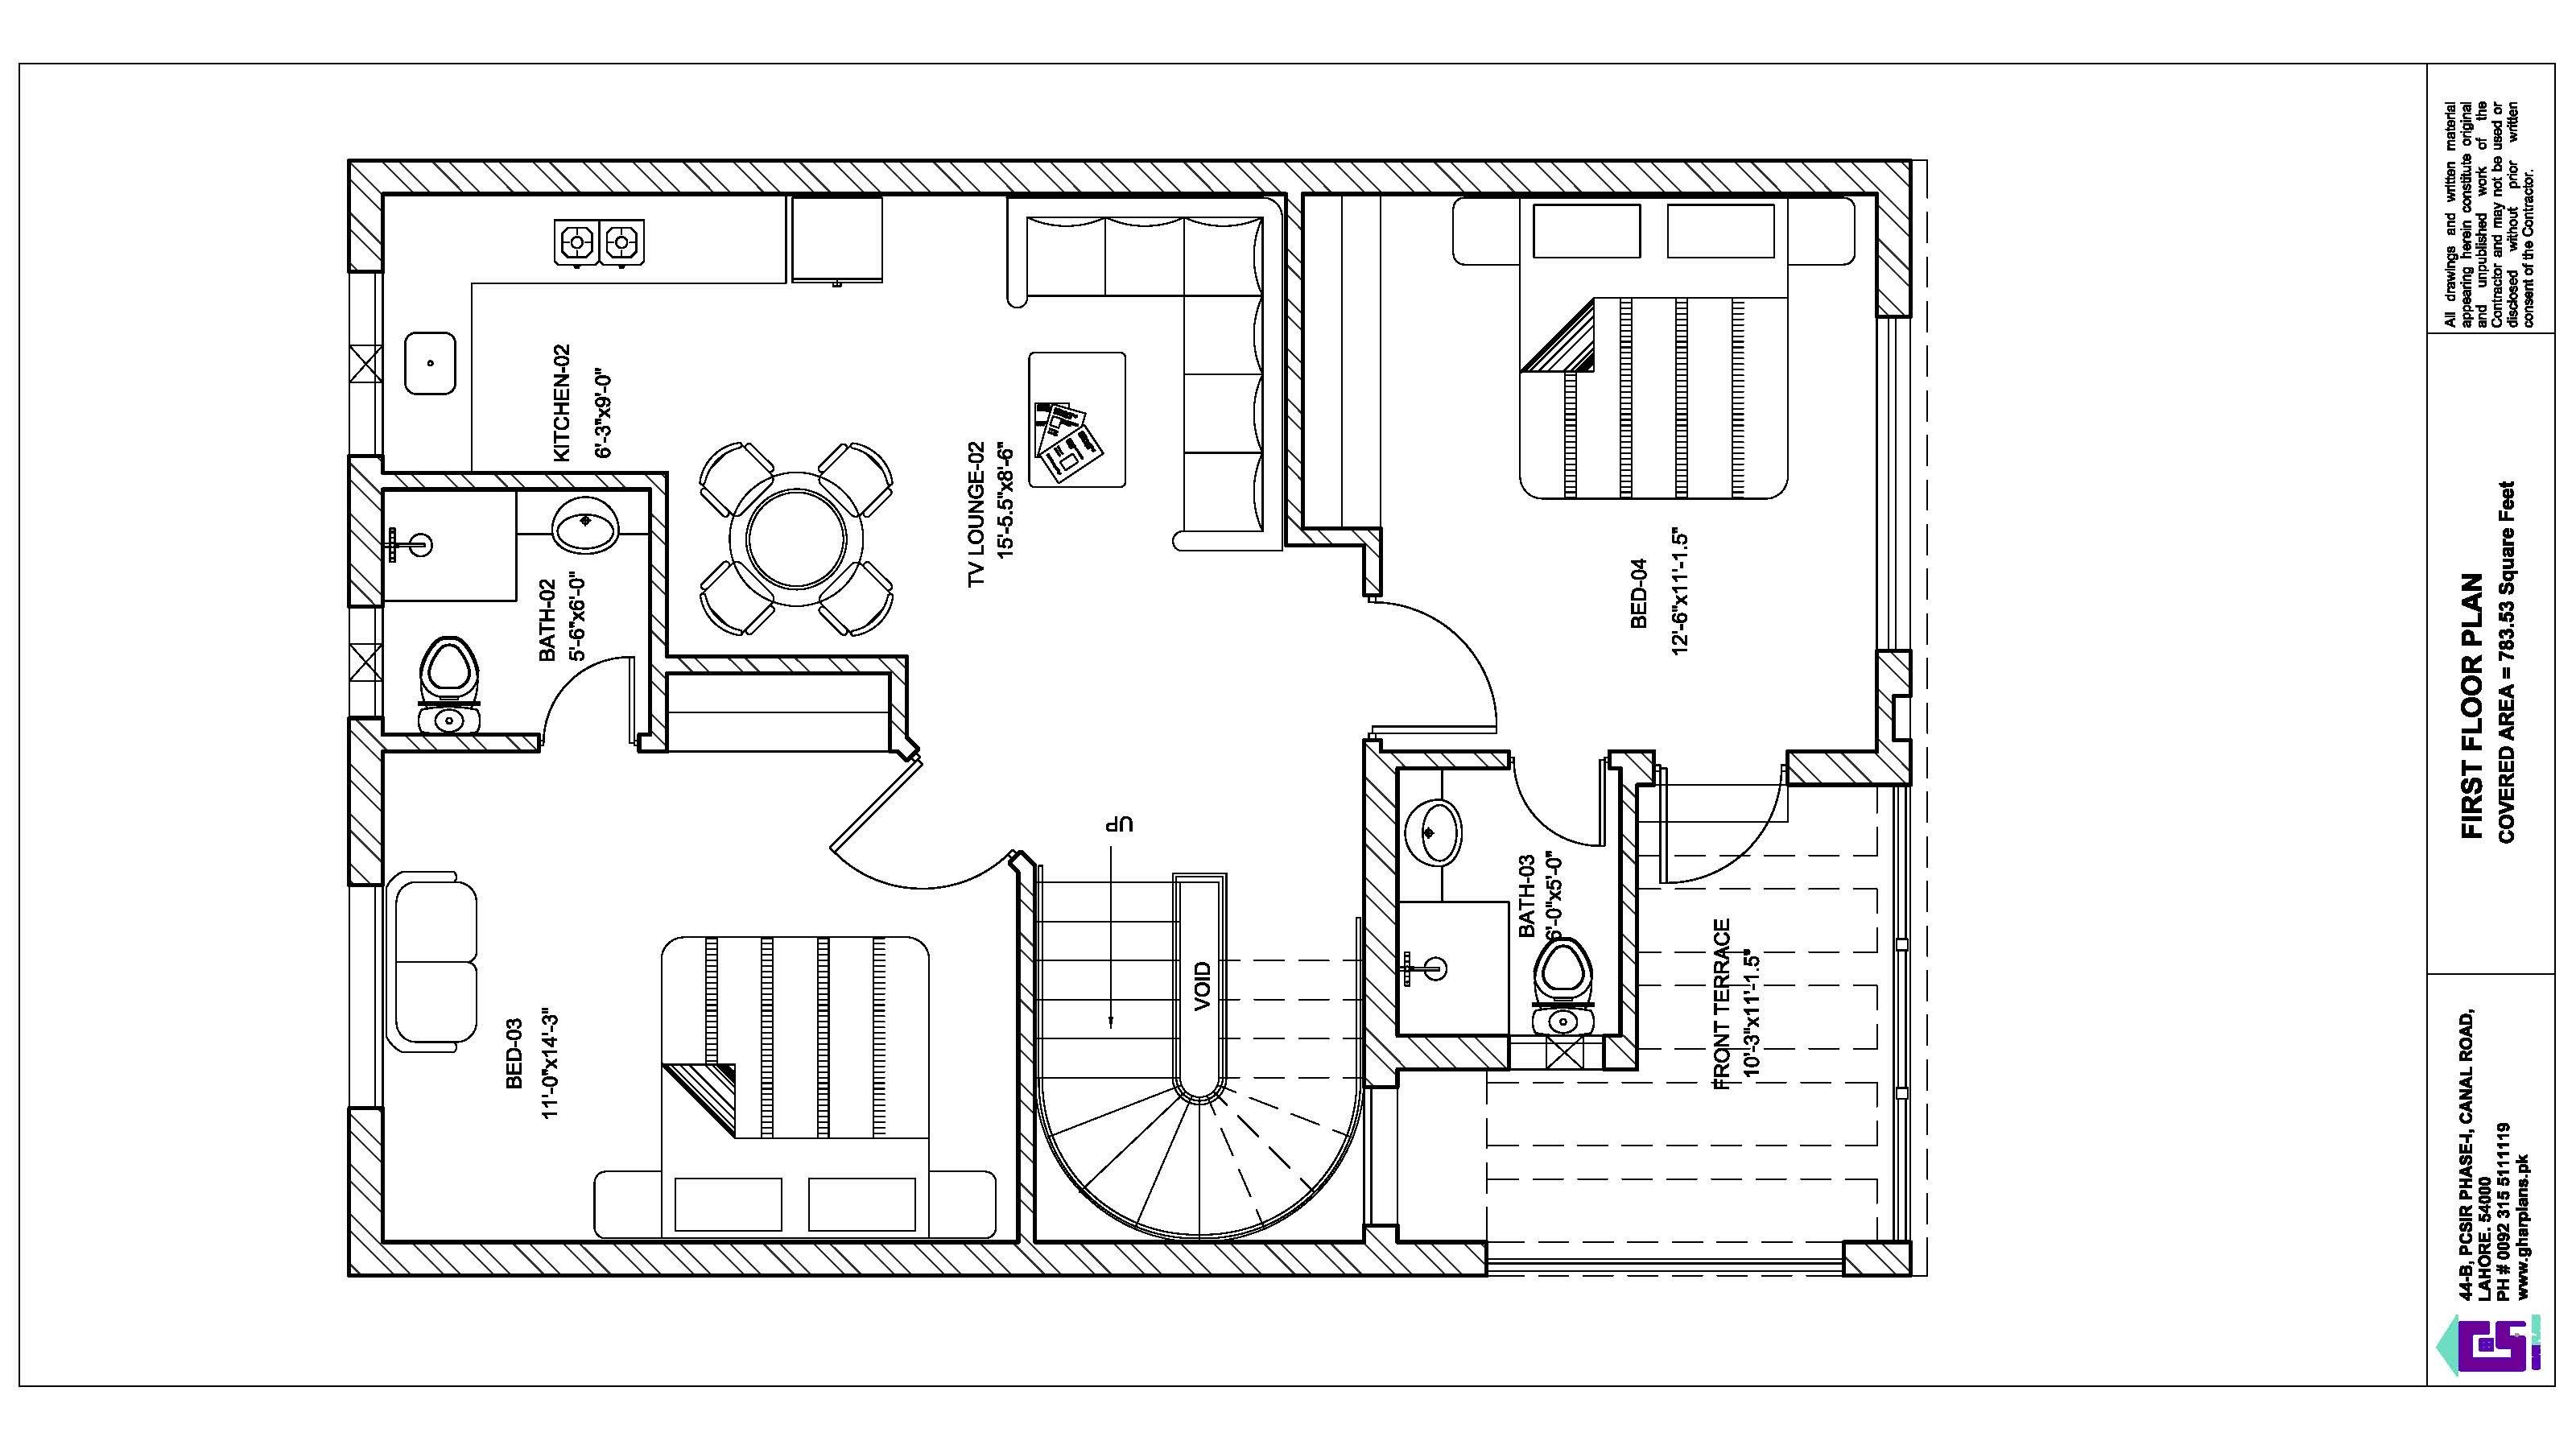 5 Marla Pakistani Home Design With Basement Floor Ghar Plans Basement Flooring House Design Free House Design